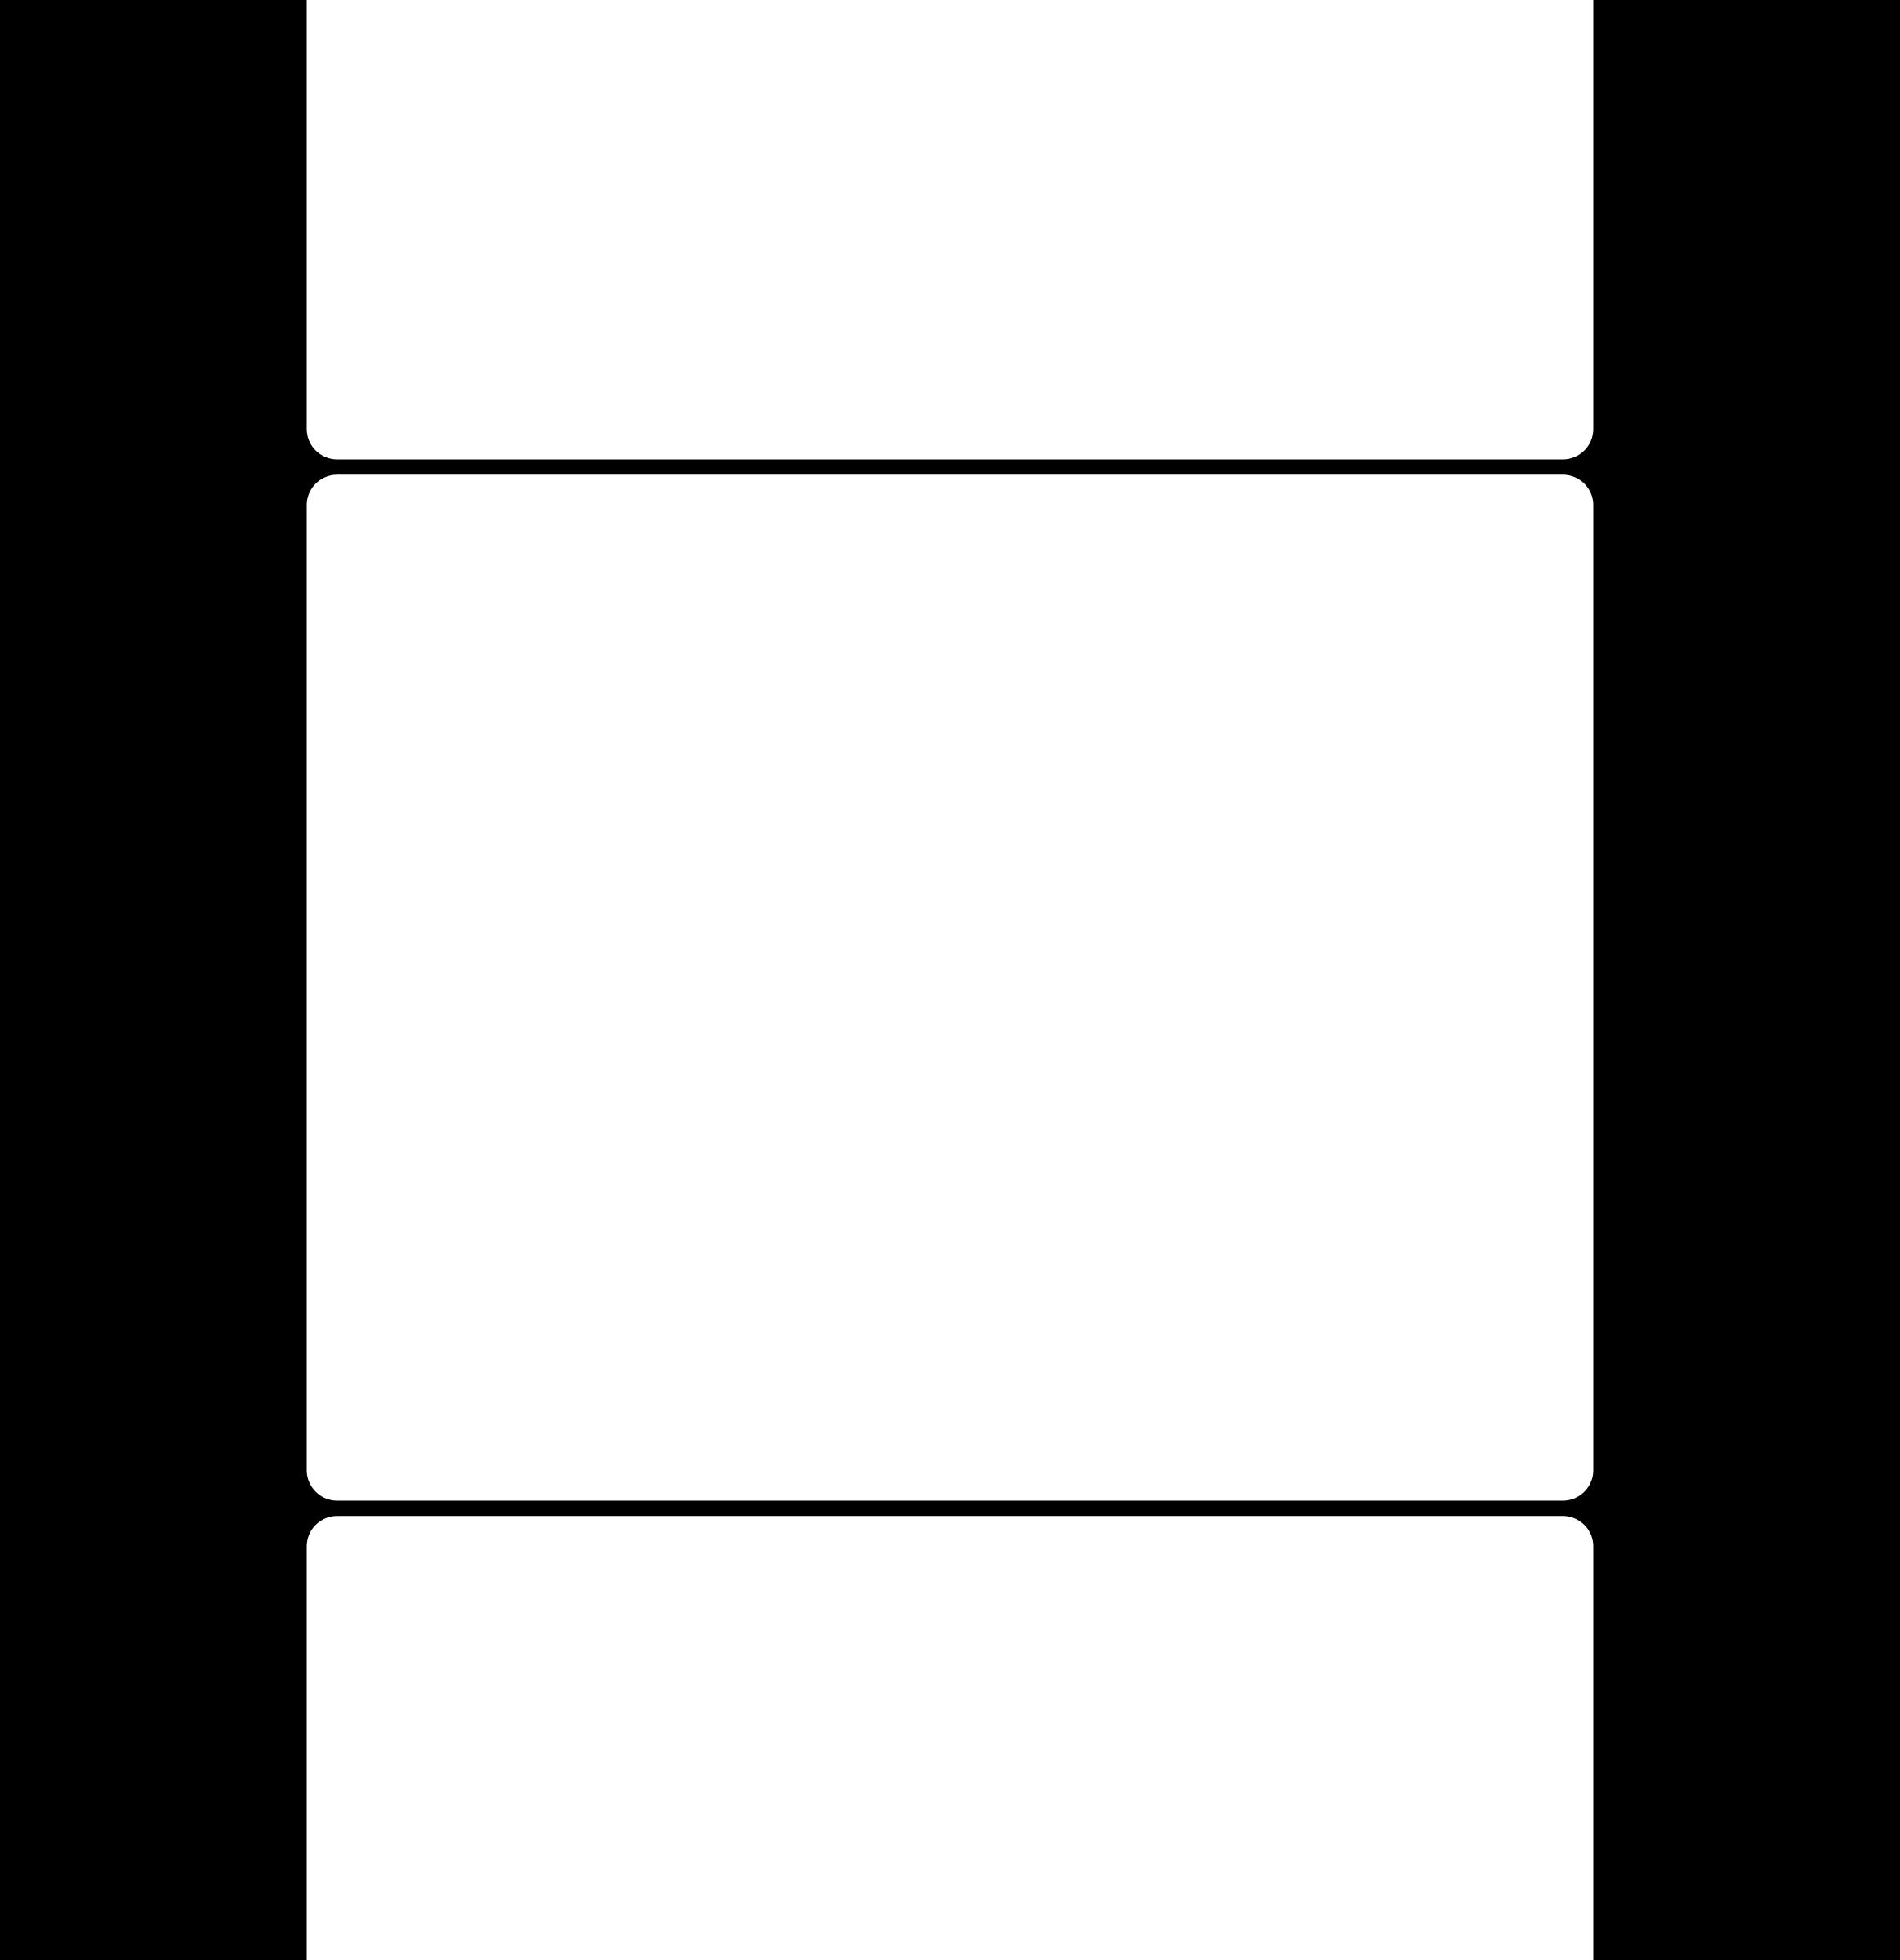 2326x2400 Clipart Film Strip Stock